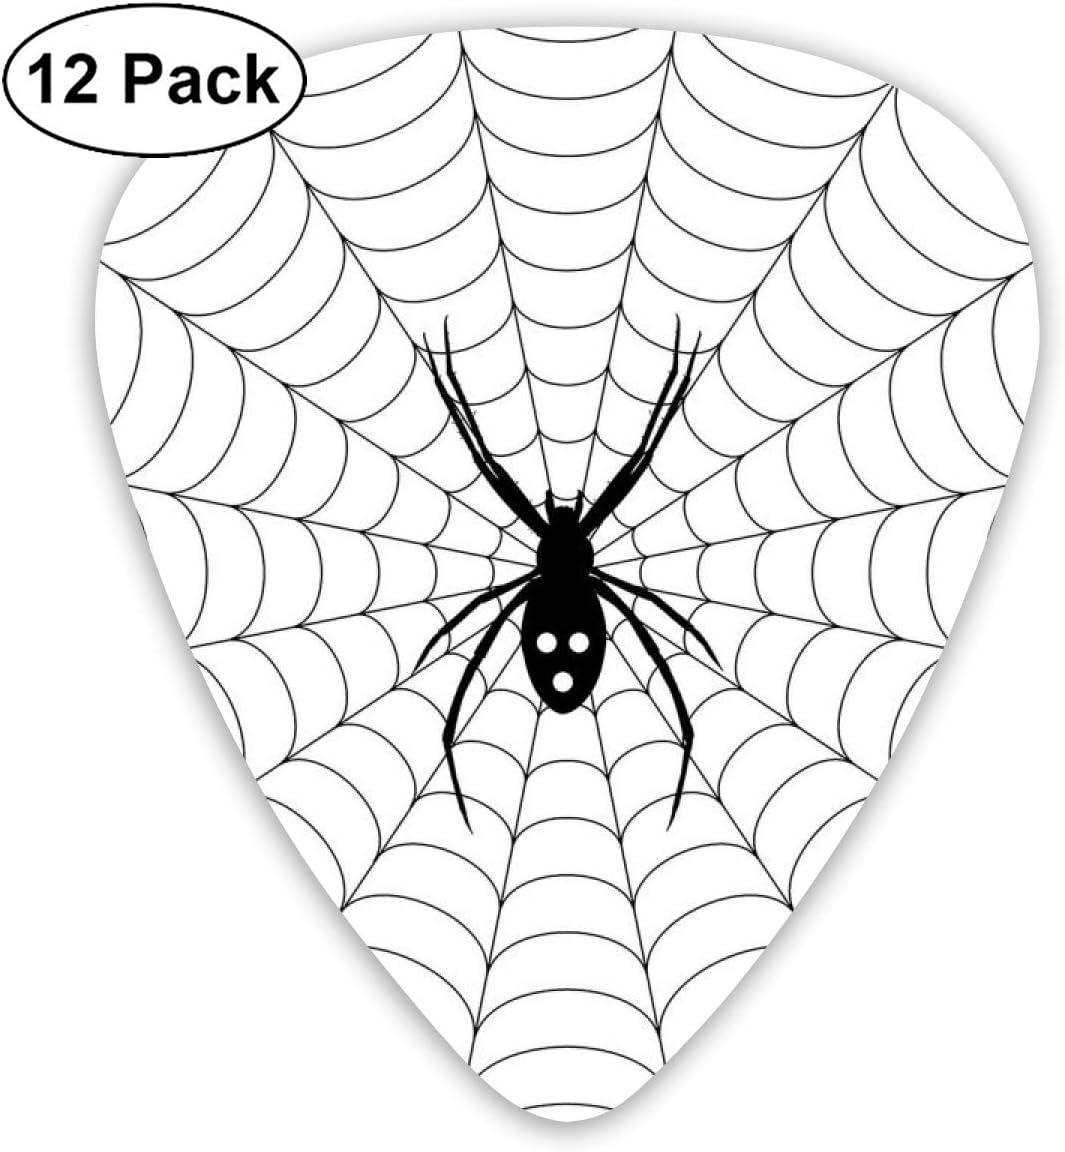 Guitar Picks12pcs Plectrum (0.46mm-0.96mm), Poisonous Bug Venom Thread Circular Cobweb Arachnid Cartoon Halloween Icon,For Your Guitar or Ukulele